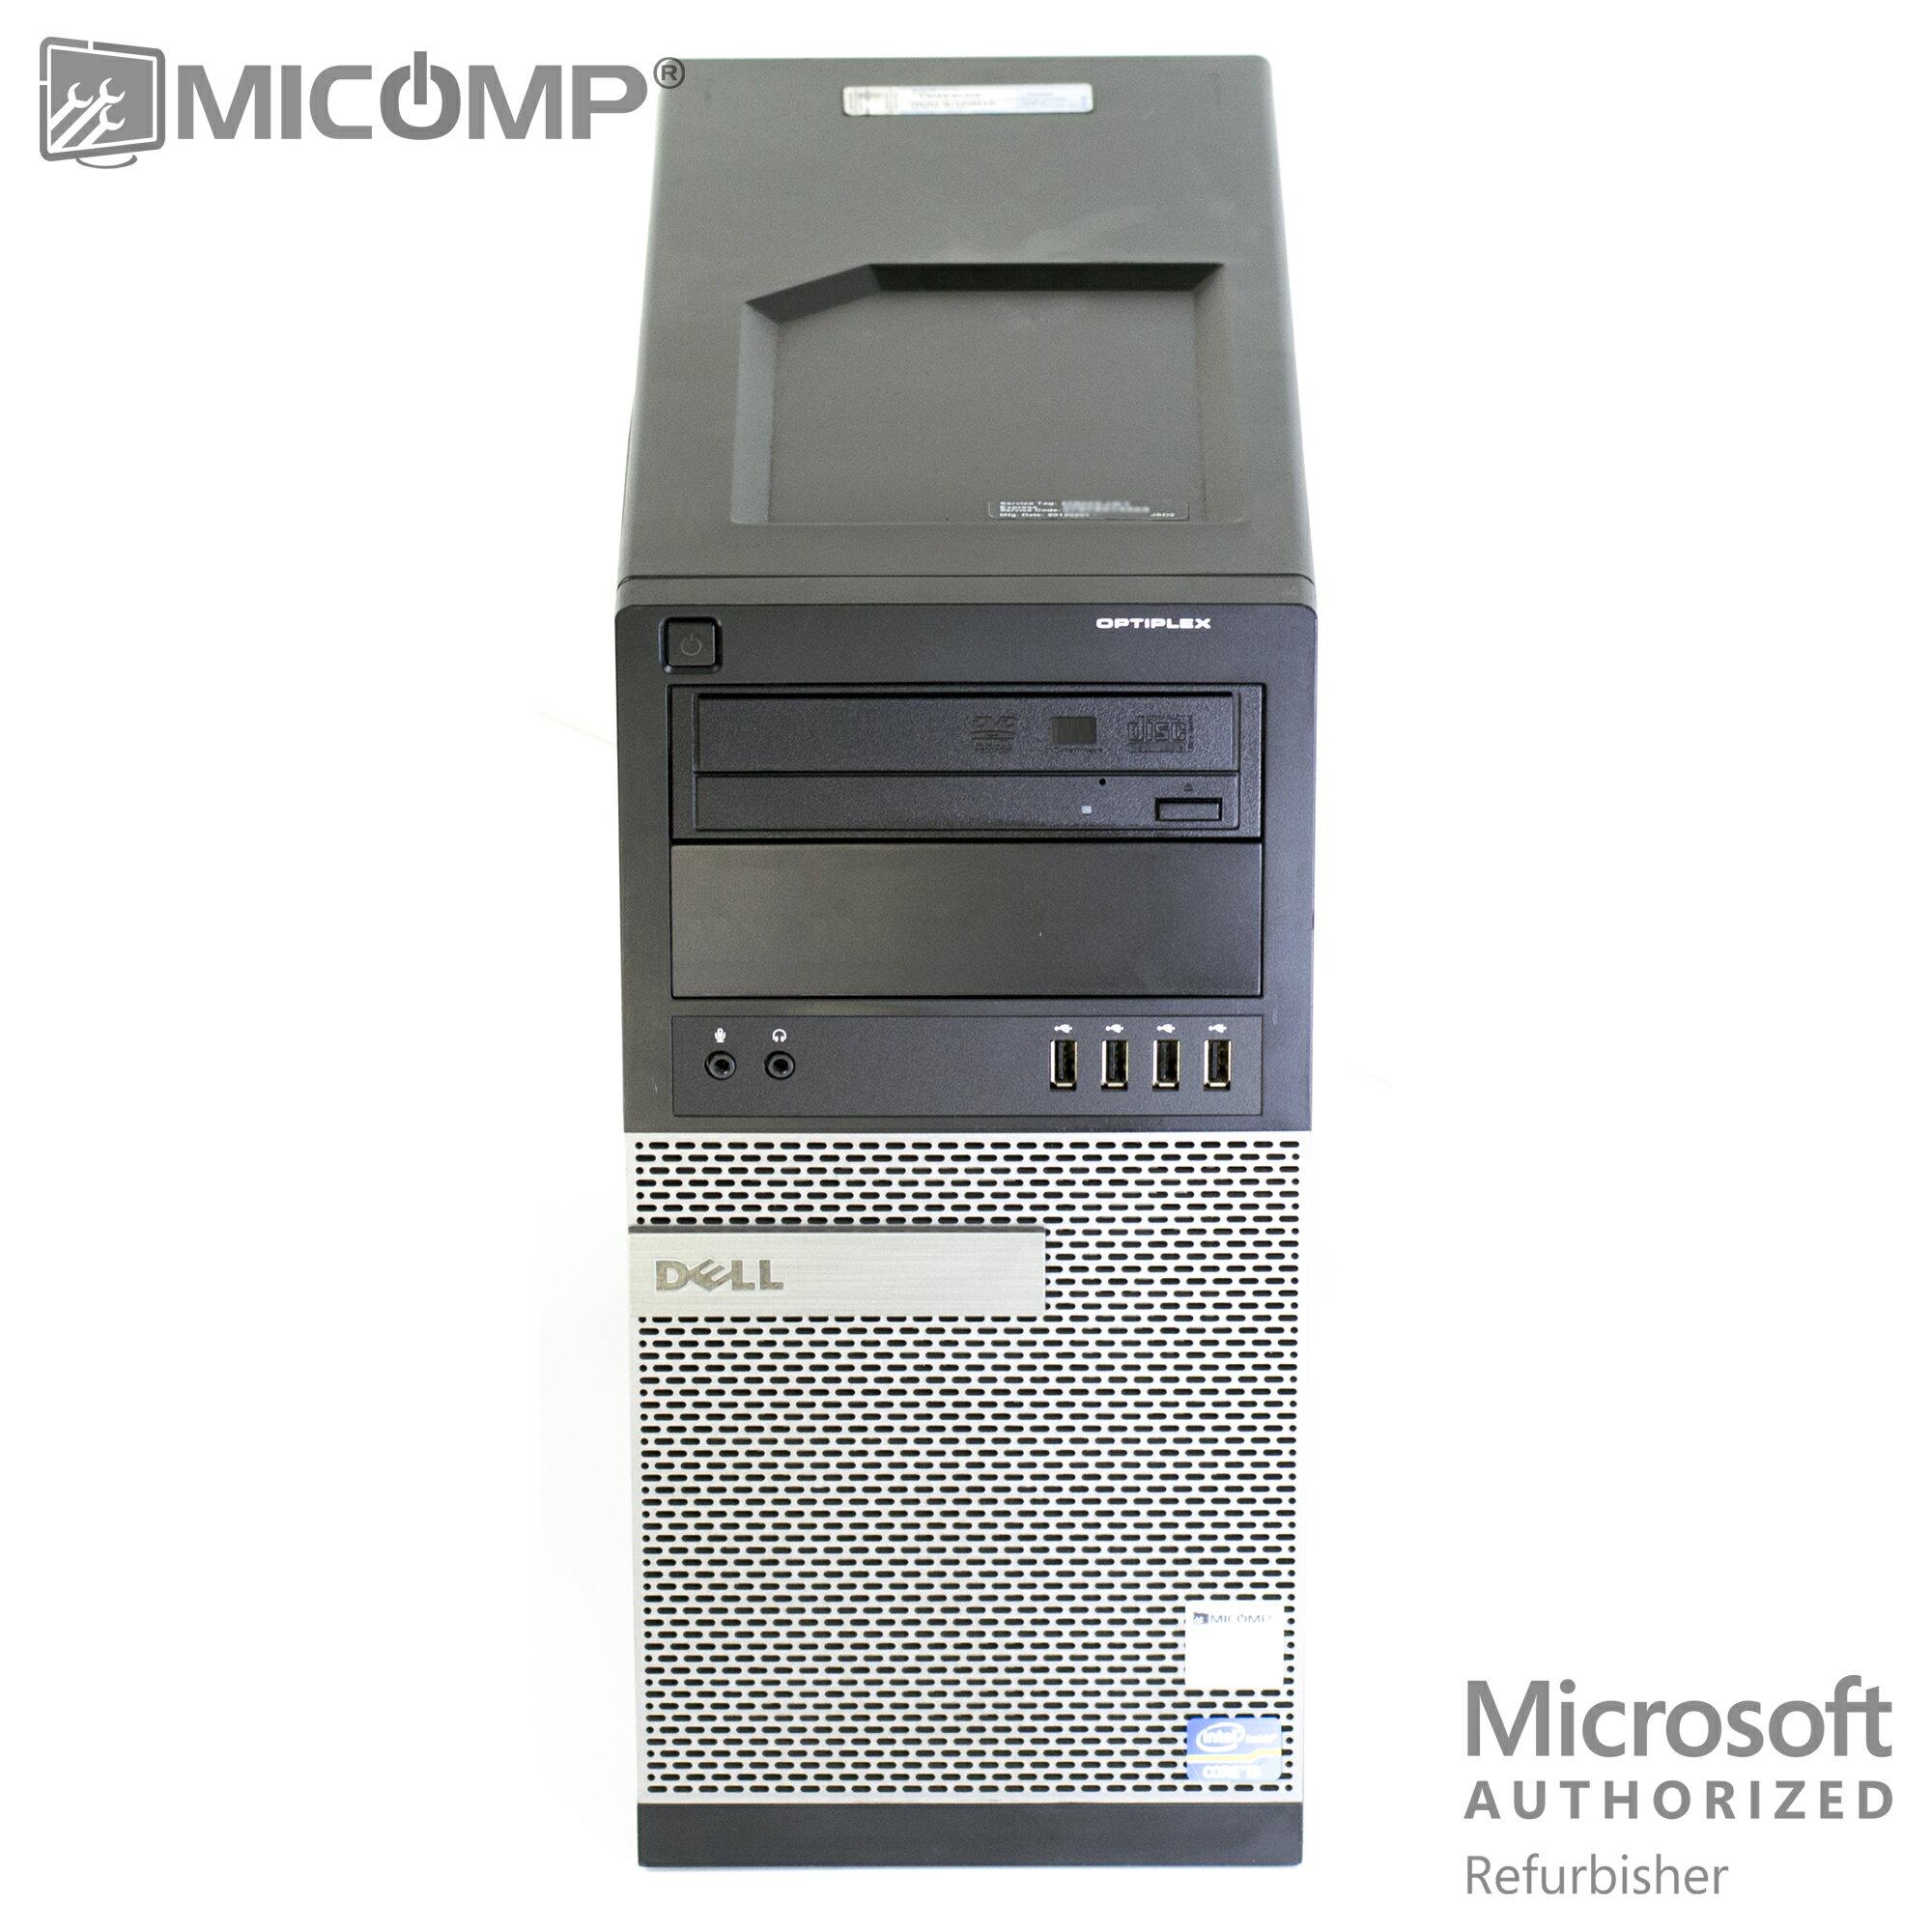 Micomp Dell Tower Gaming Computer Pc Nvidia Gtx 1050 Ti 4gb